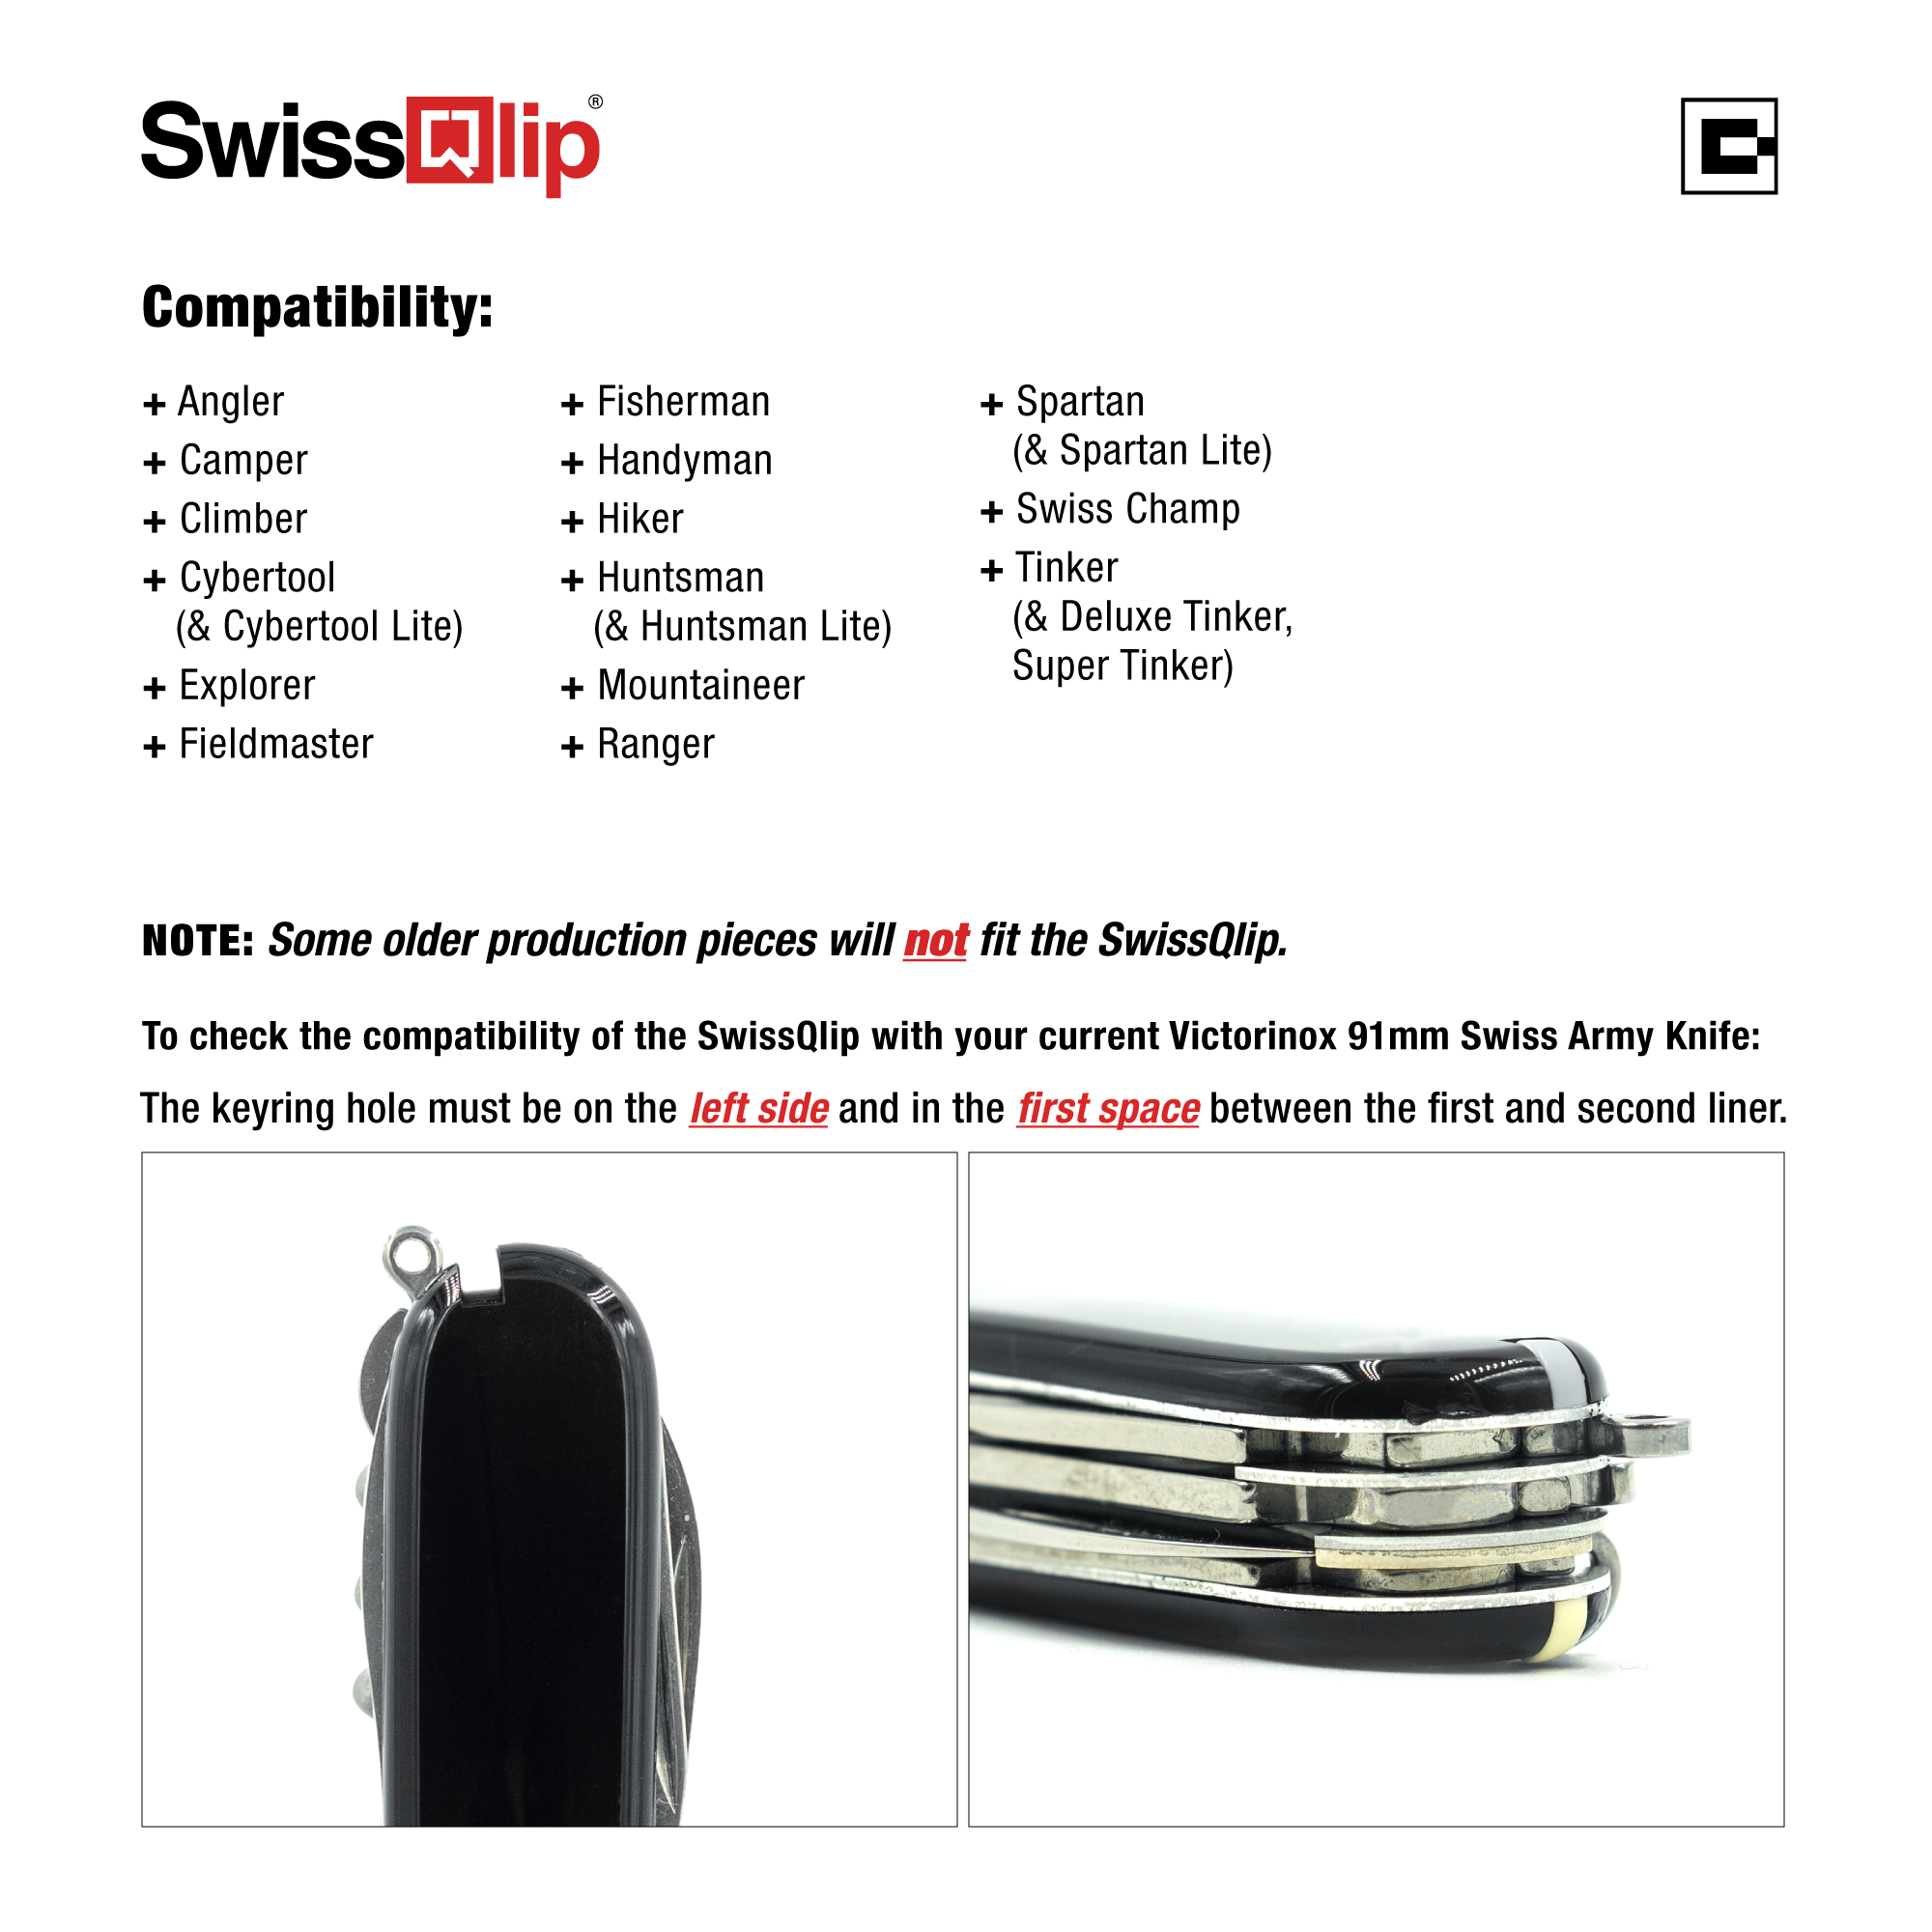 swissqlipcompatibility.png